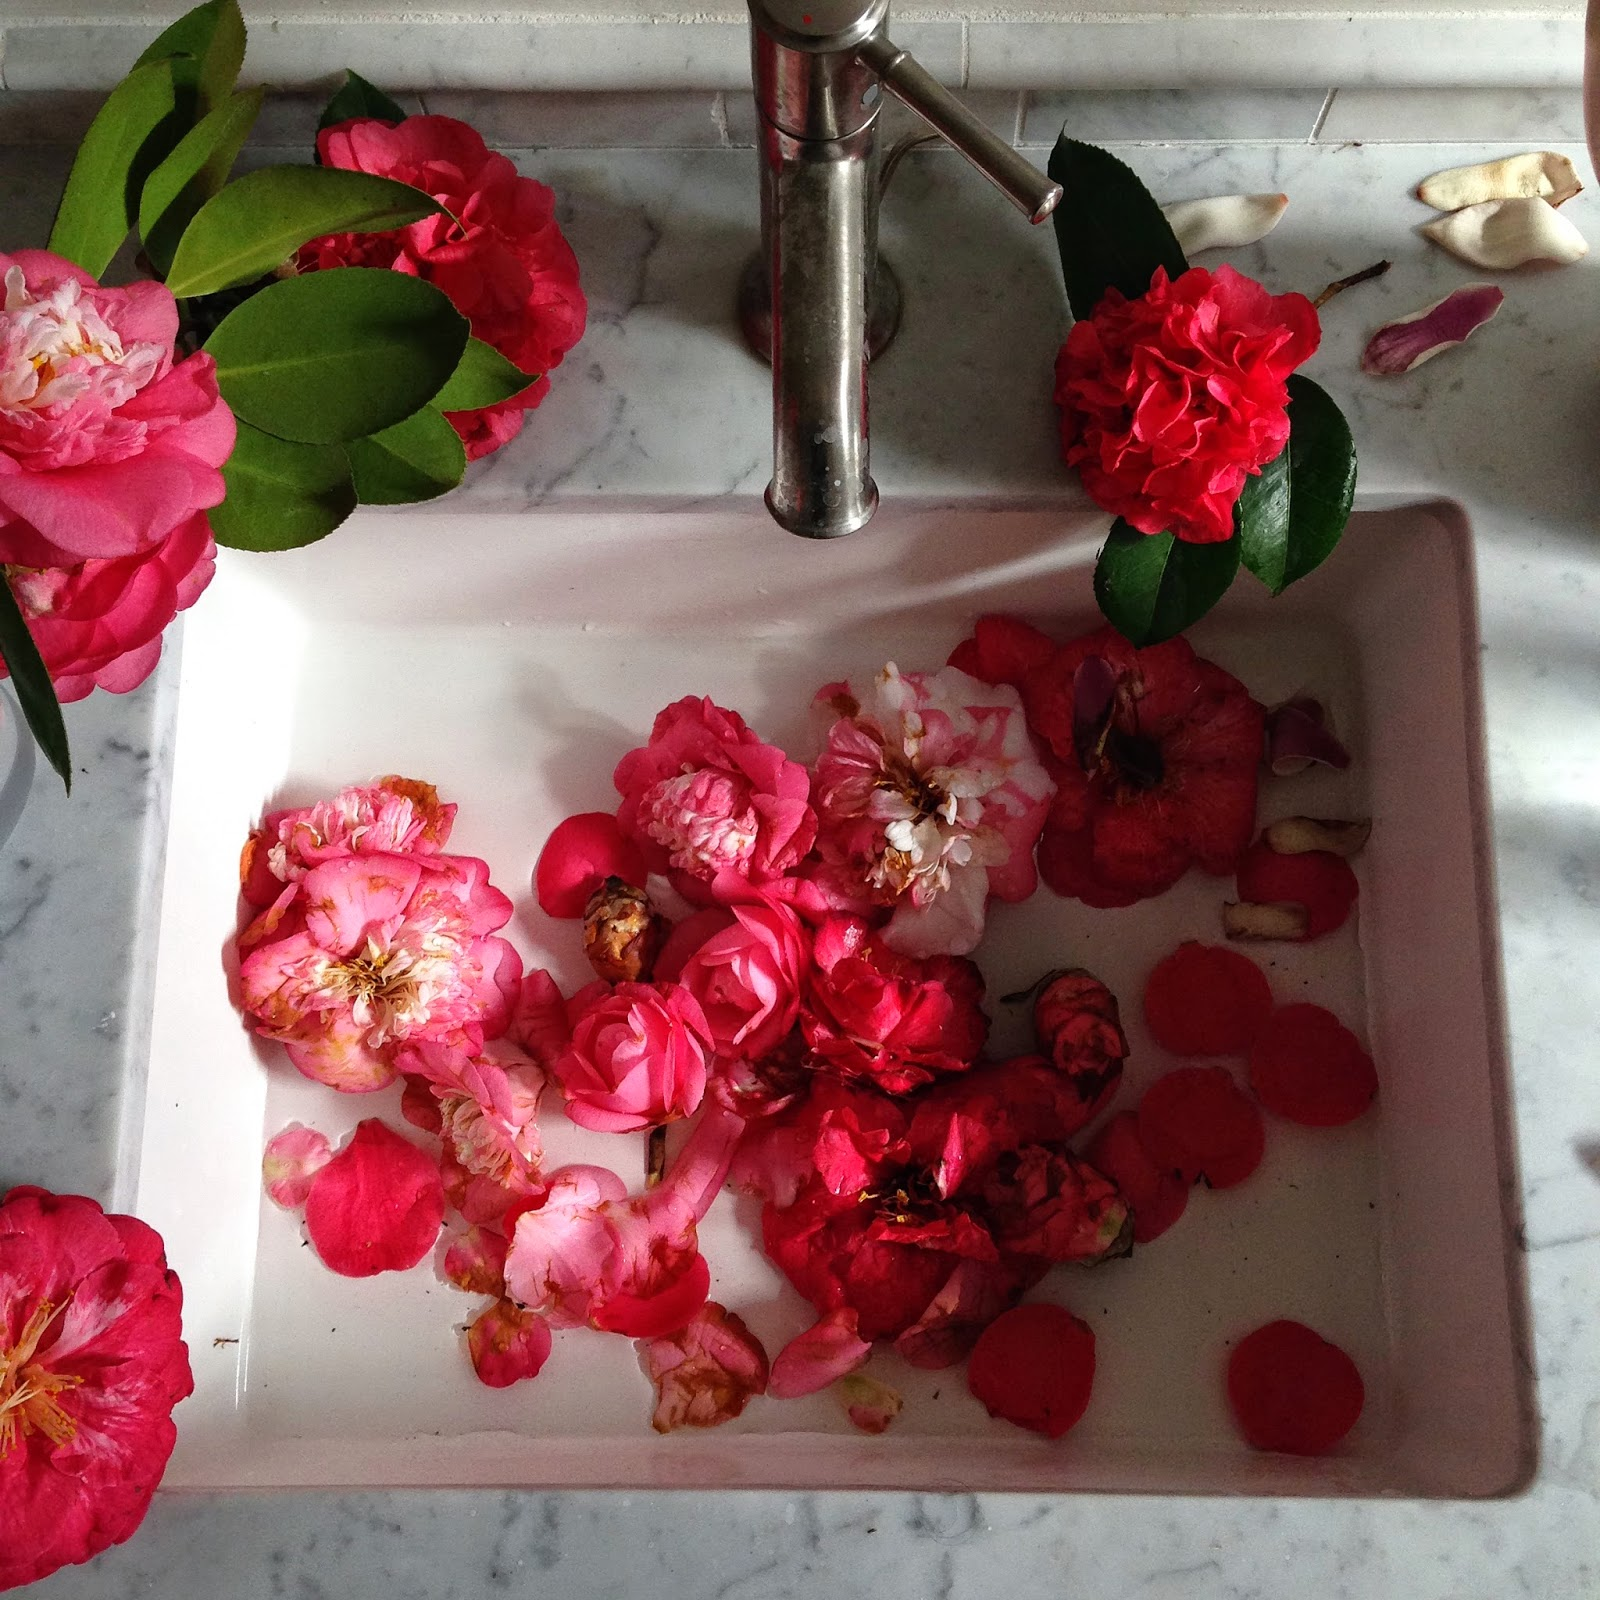 camellias sophia moreno bunge